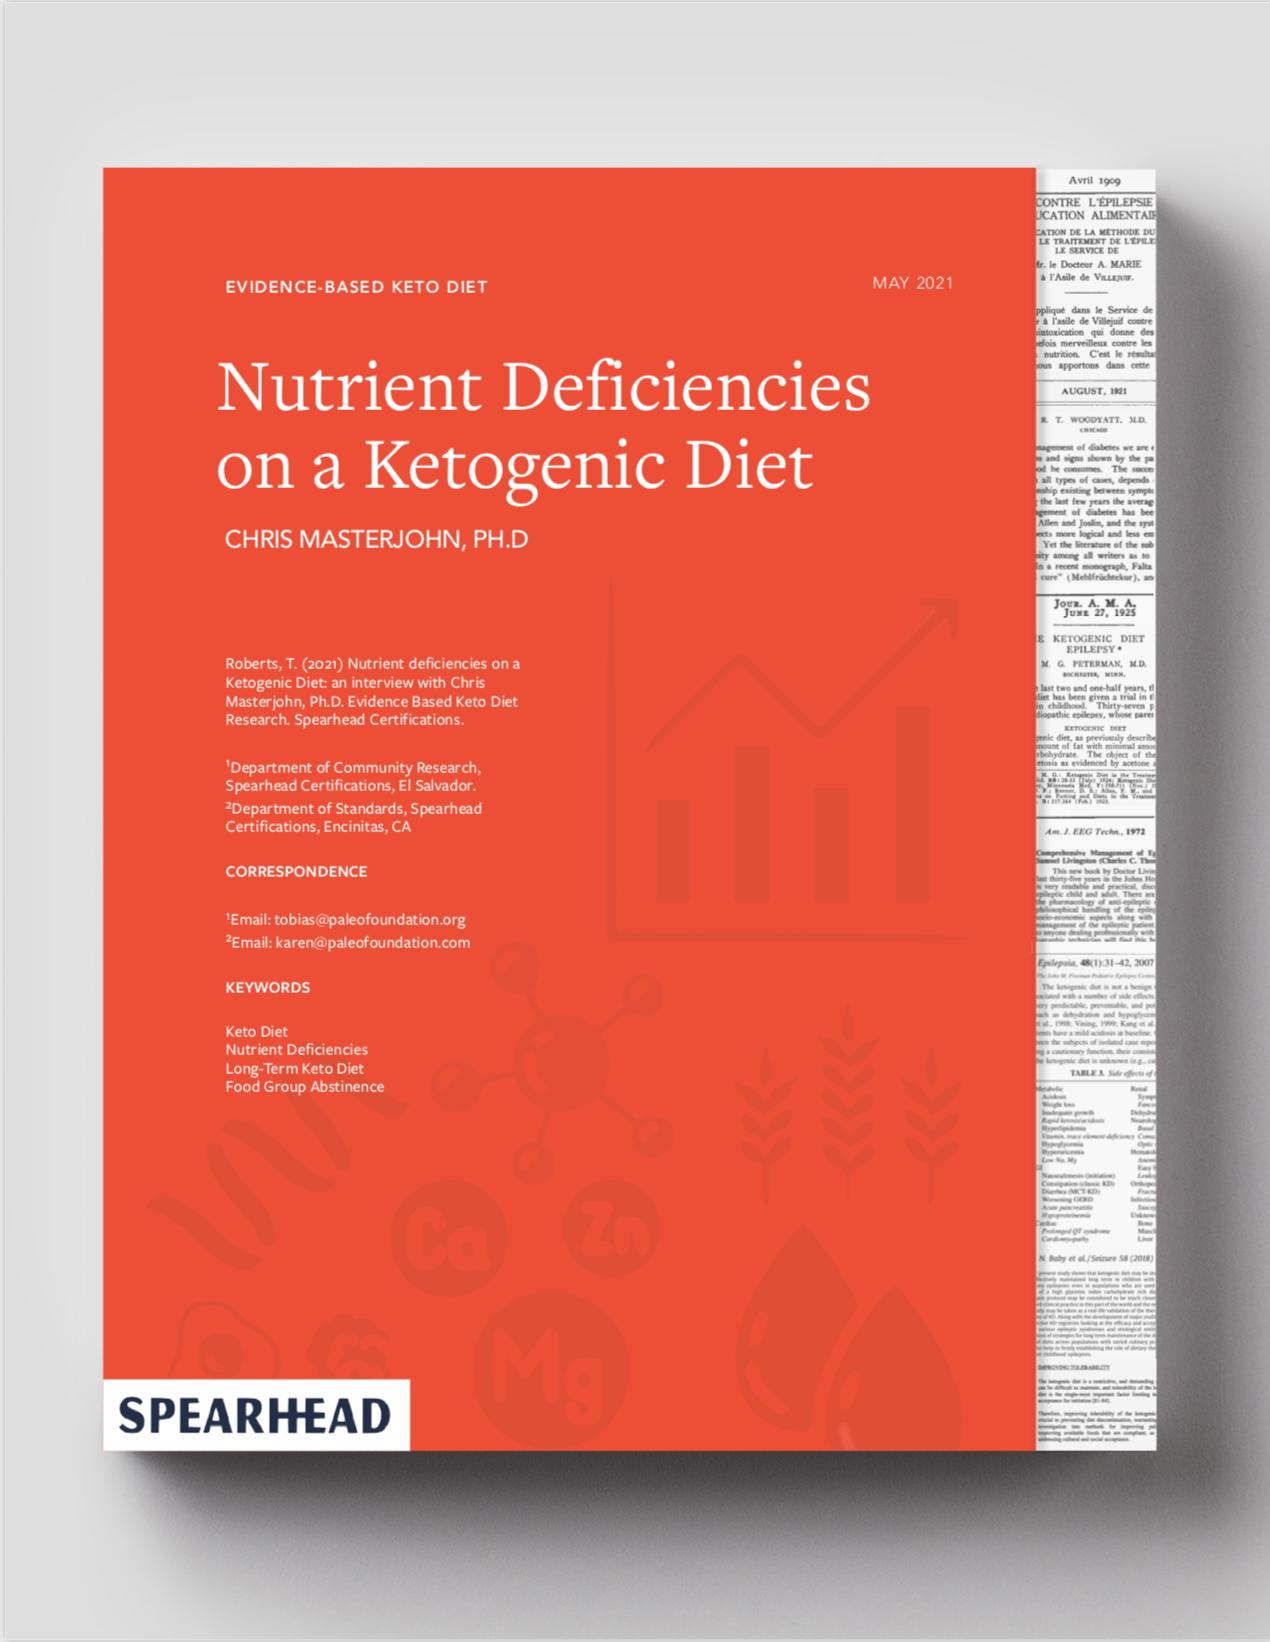 Nutrient Deficiencies on a Ketogenic Diet Chris Masterjohn Ph.D.